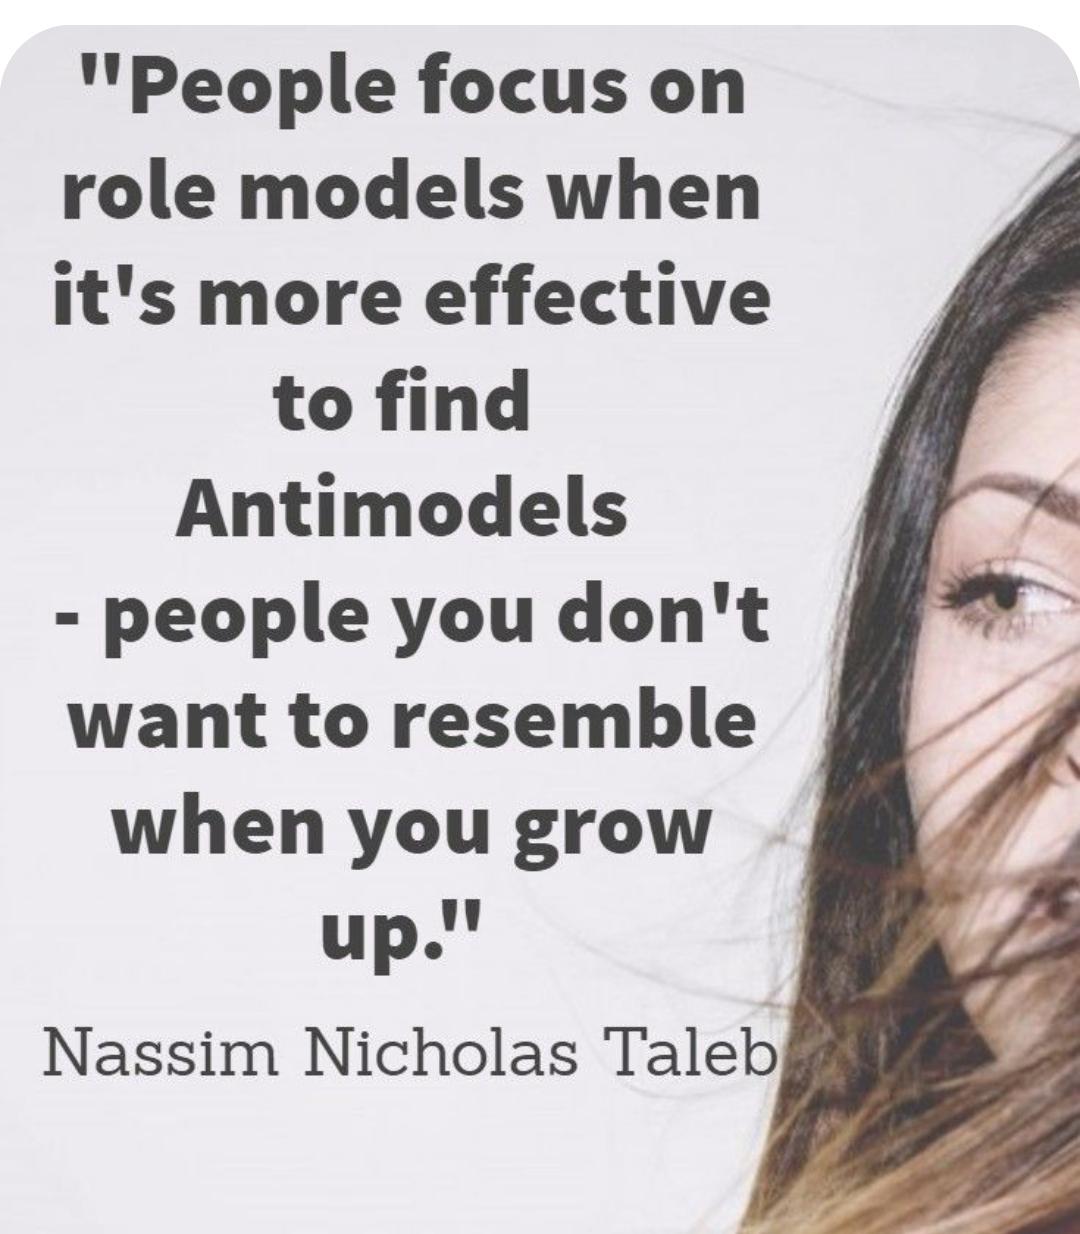 [Image] Role models